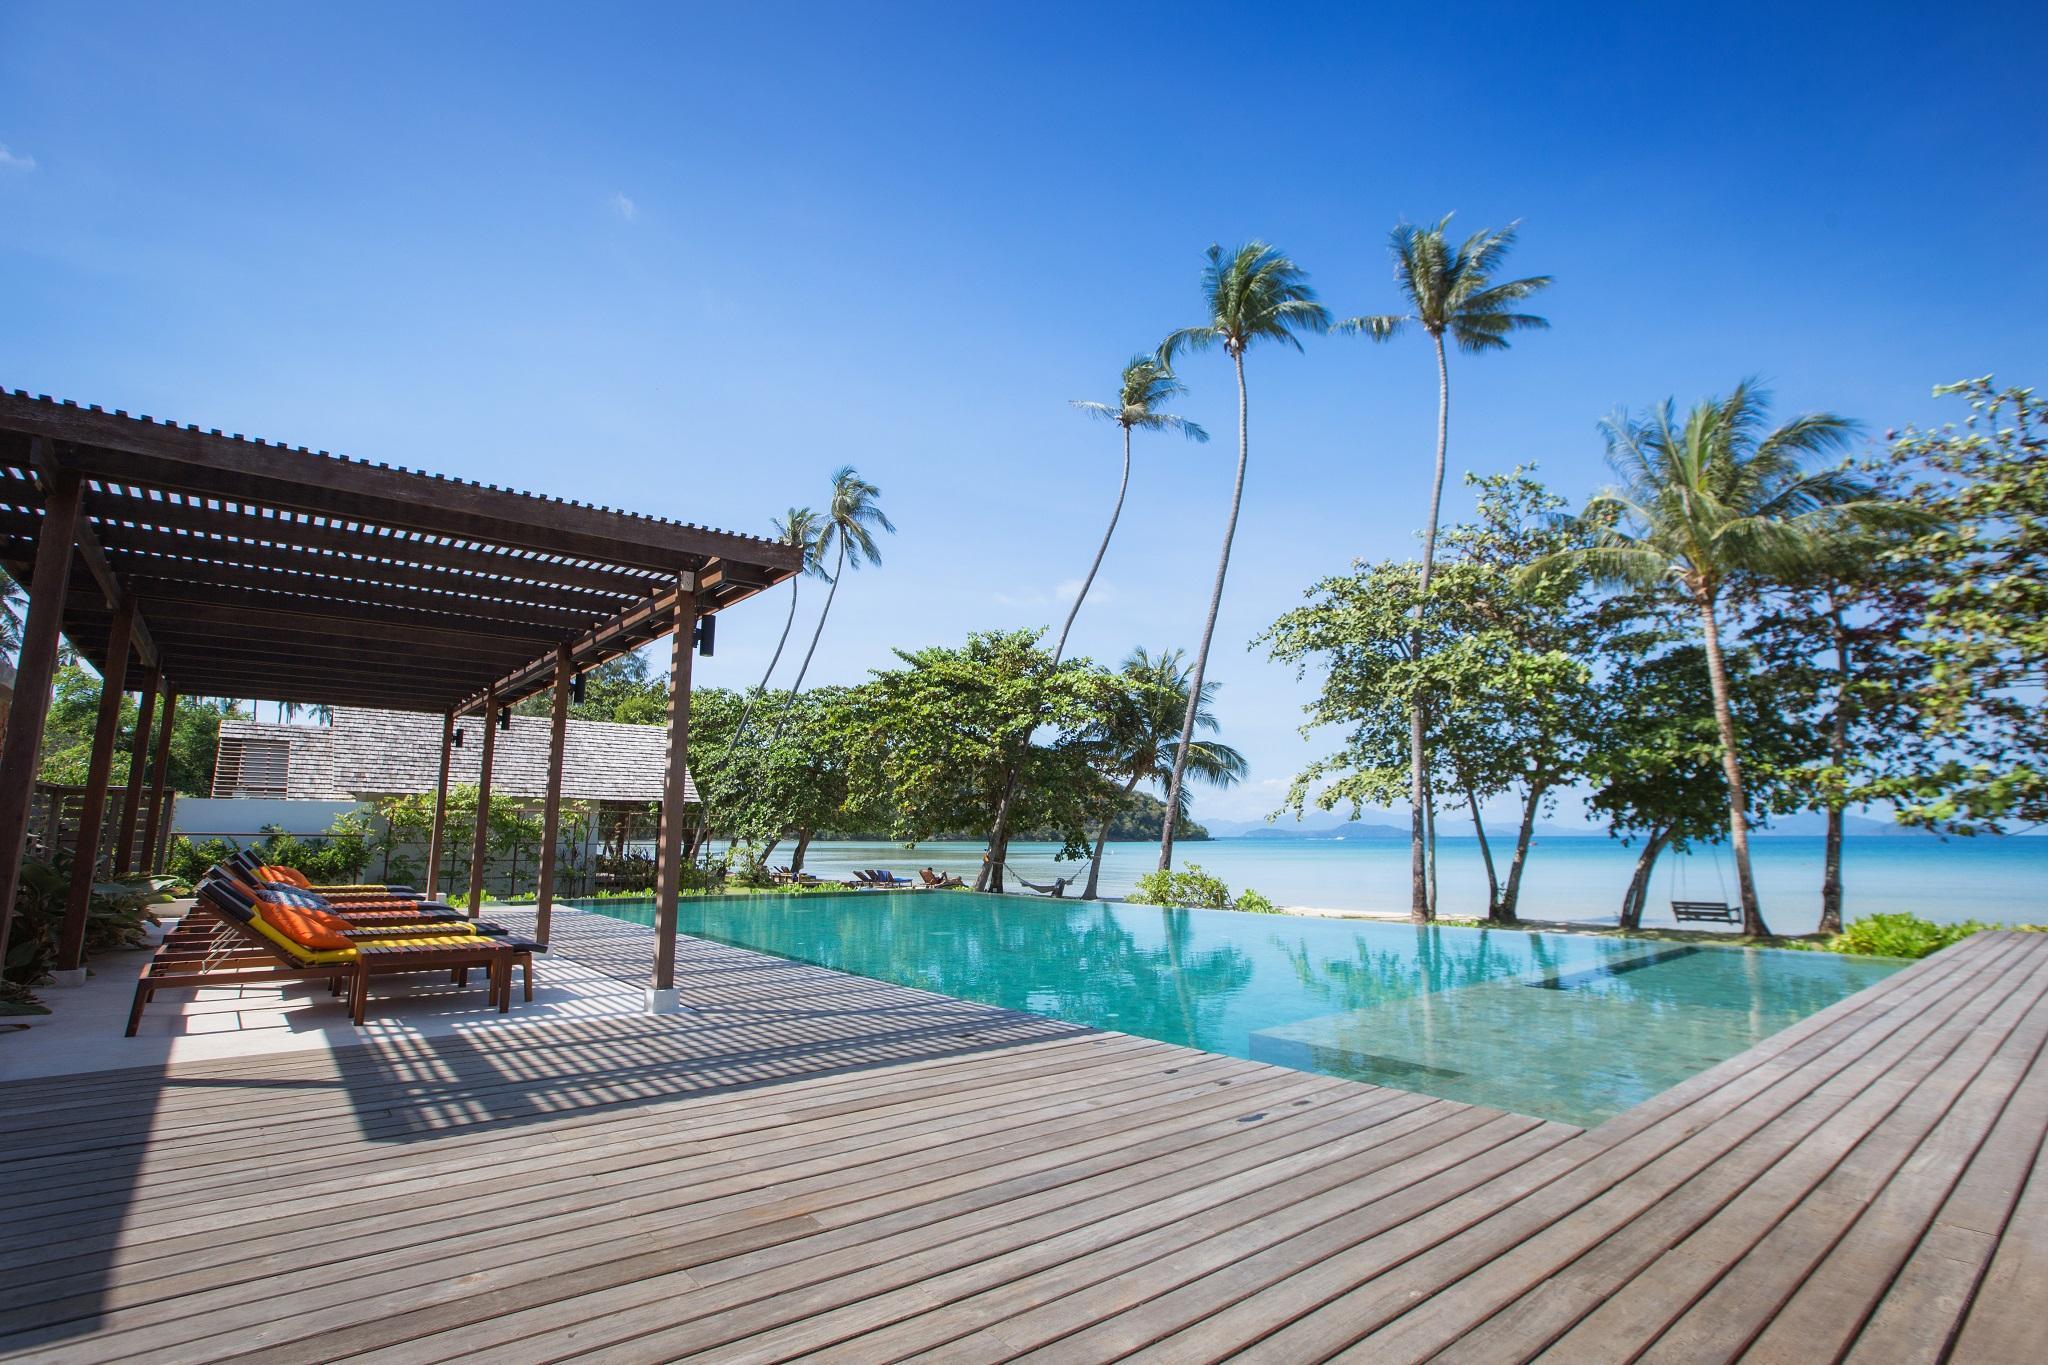 Mira Montra Resort Koh Mak มิรา มนตรา รีสอร์ท เกาะหมาก